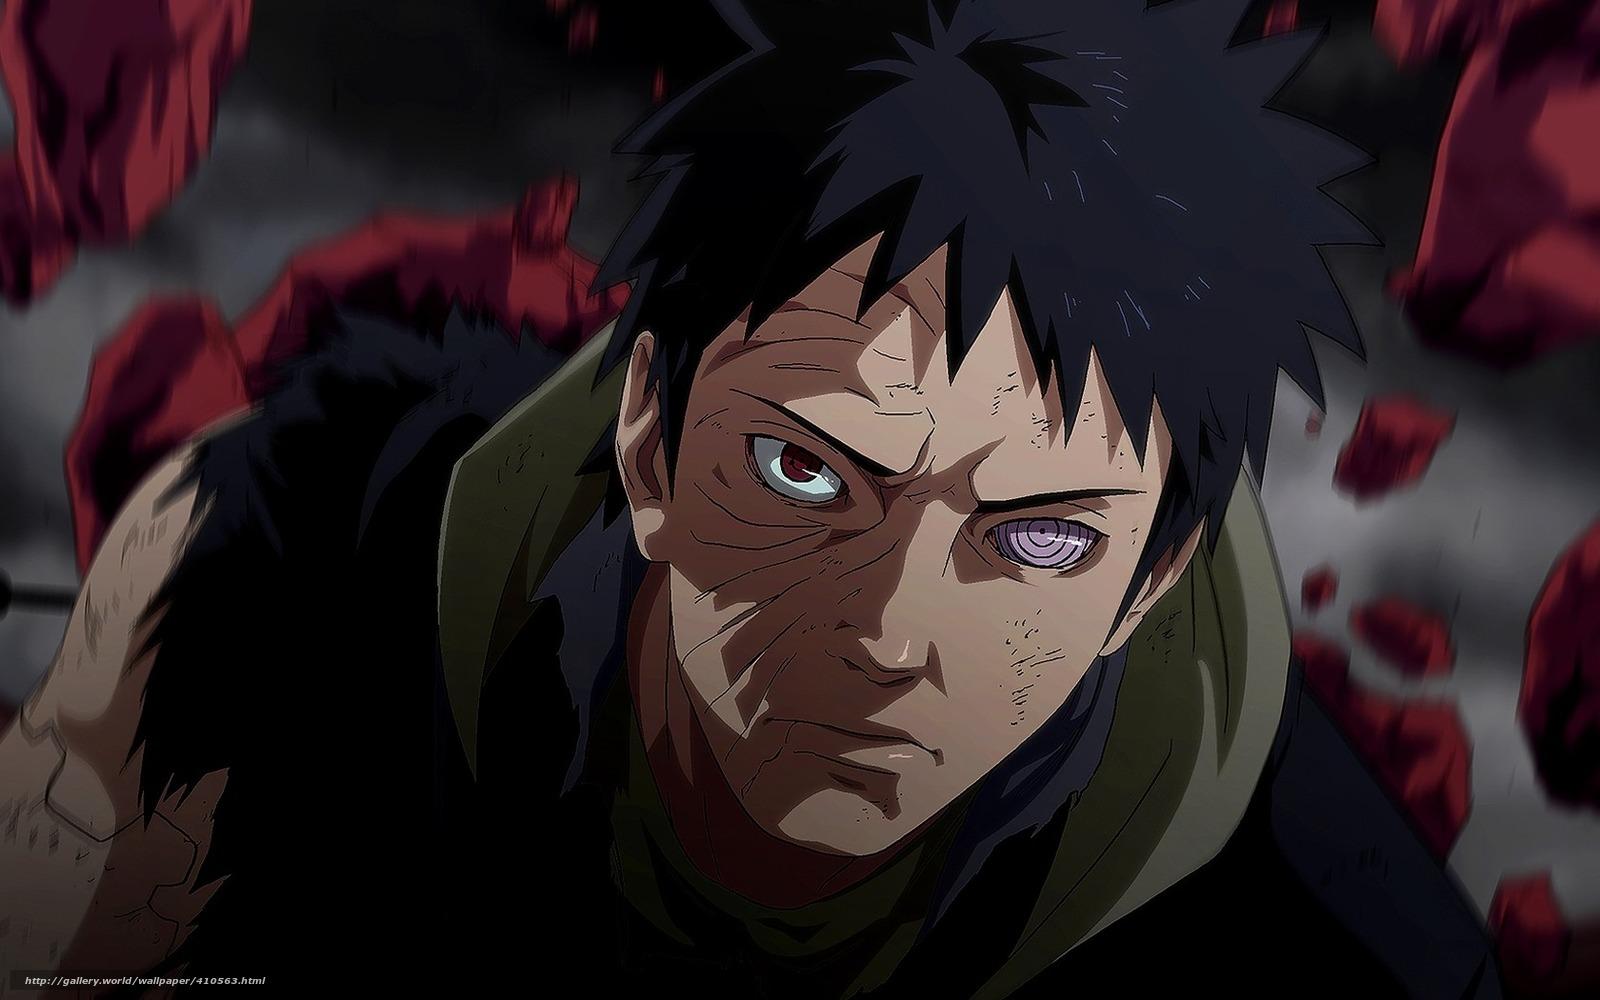 Download wallpaper Naruto hurricane chronicles Uchiha Obito 1600x1000